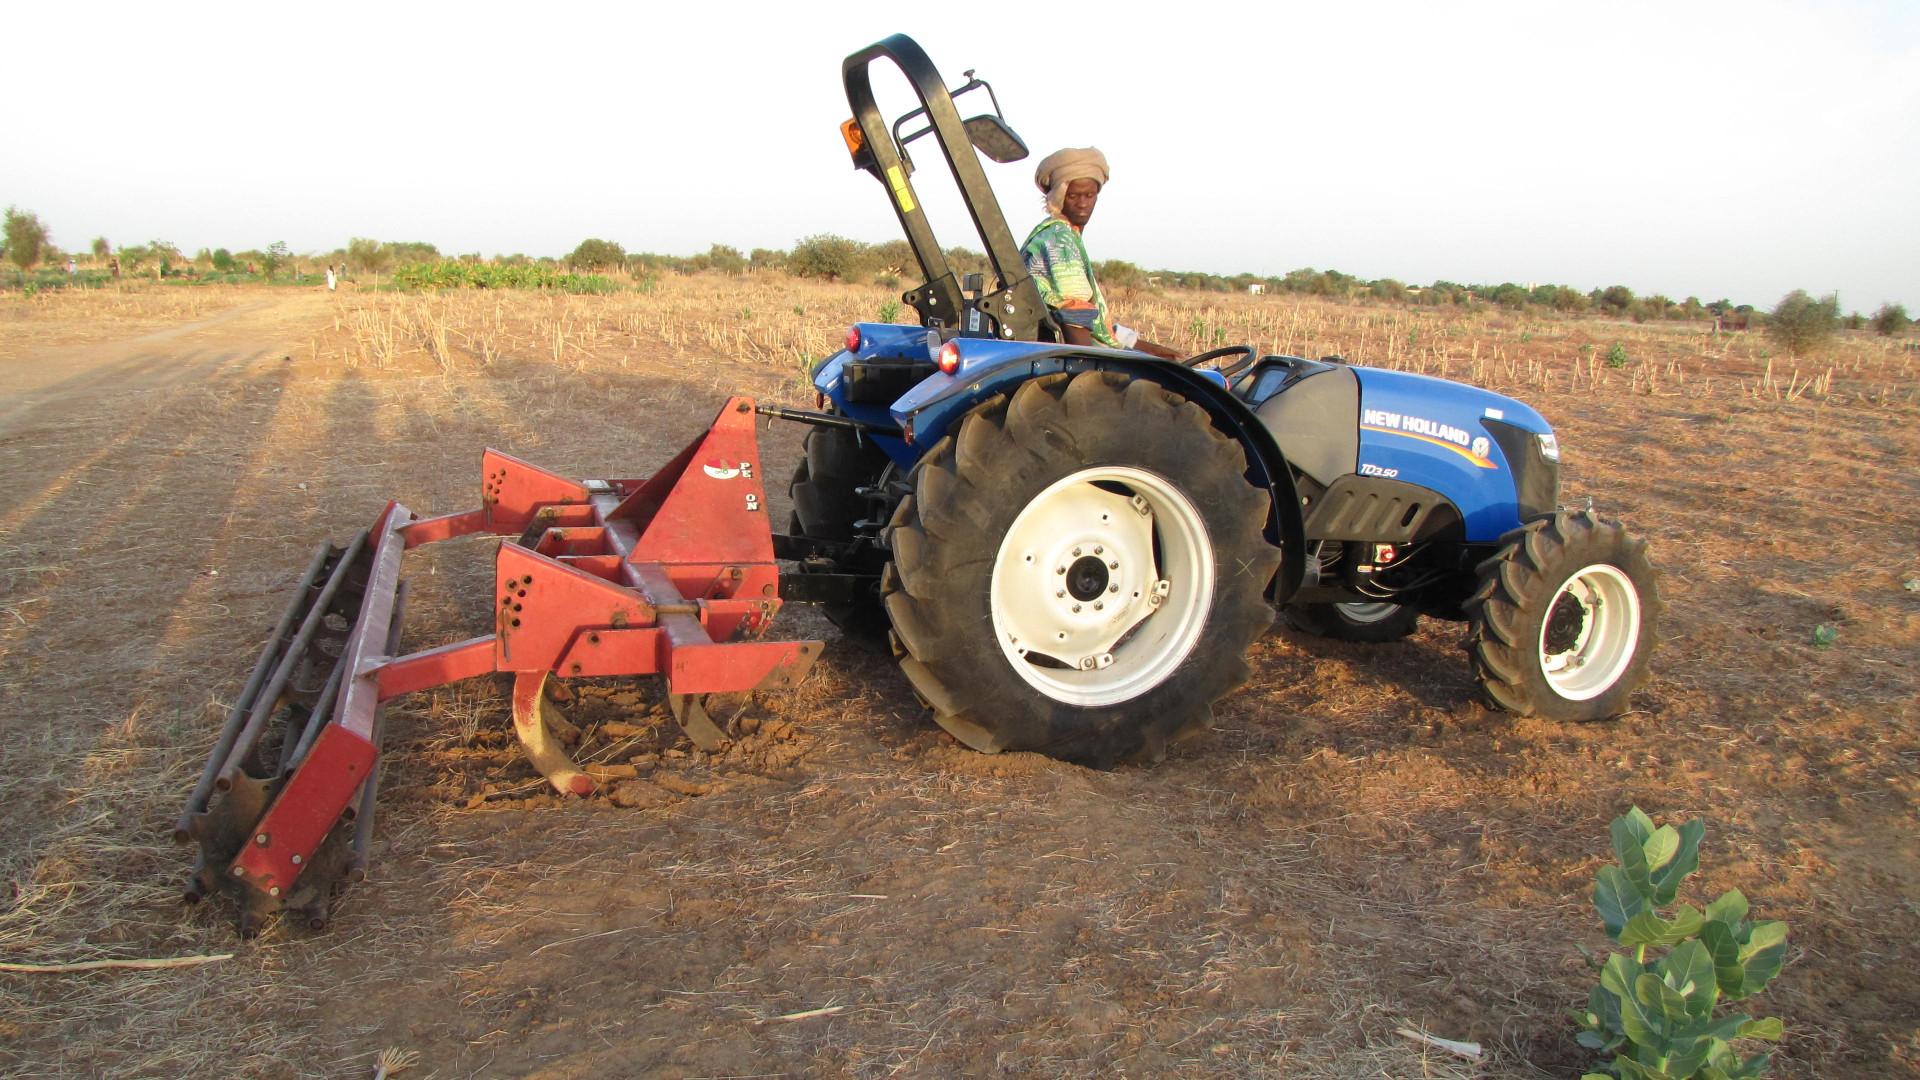 cultivator - tandeg voor de harde afrikaanse bodem